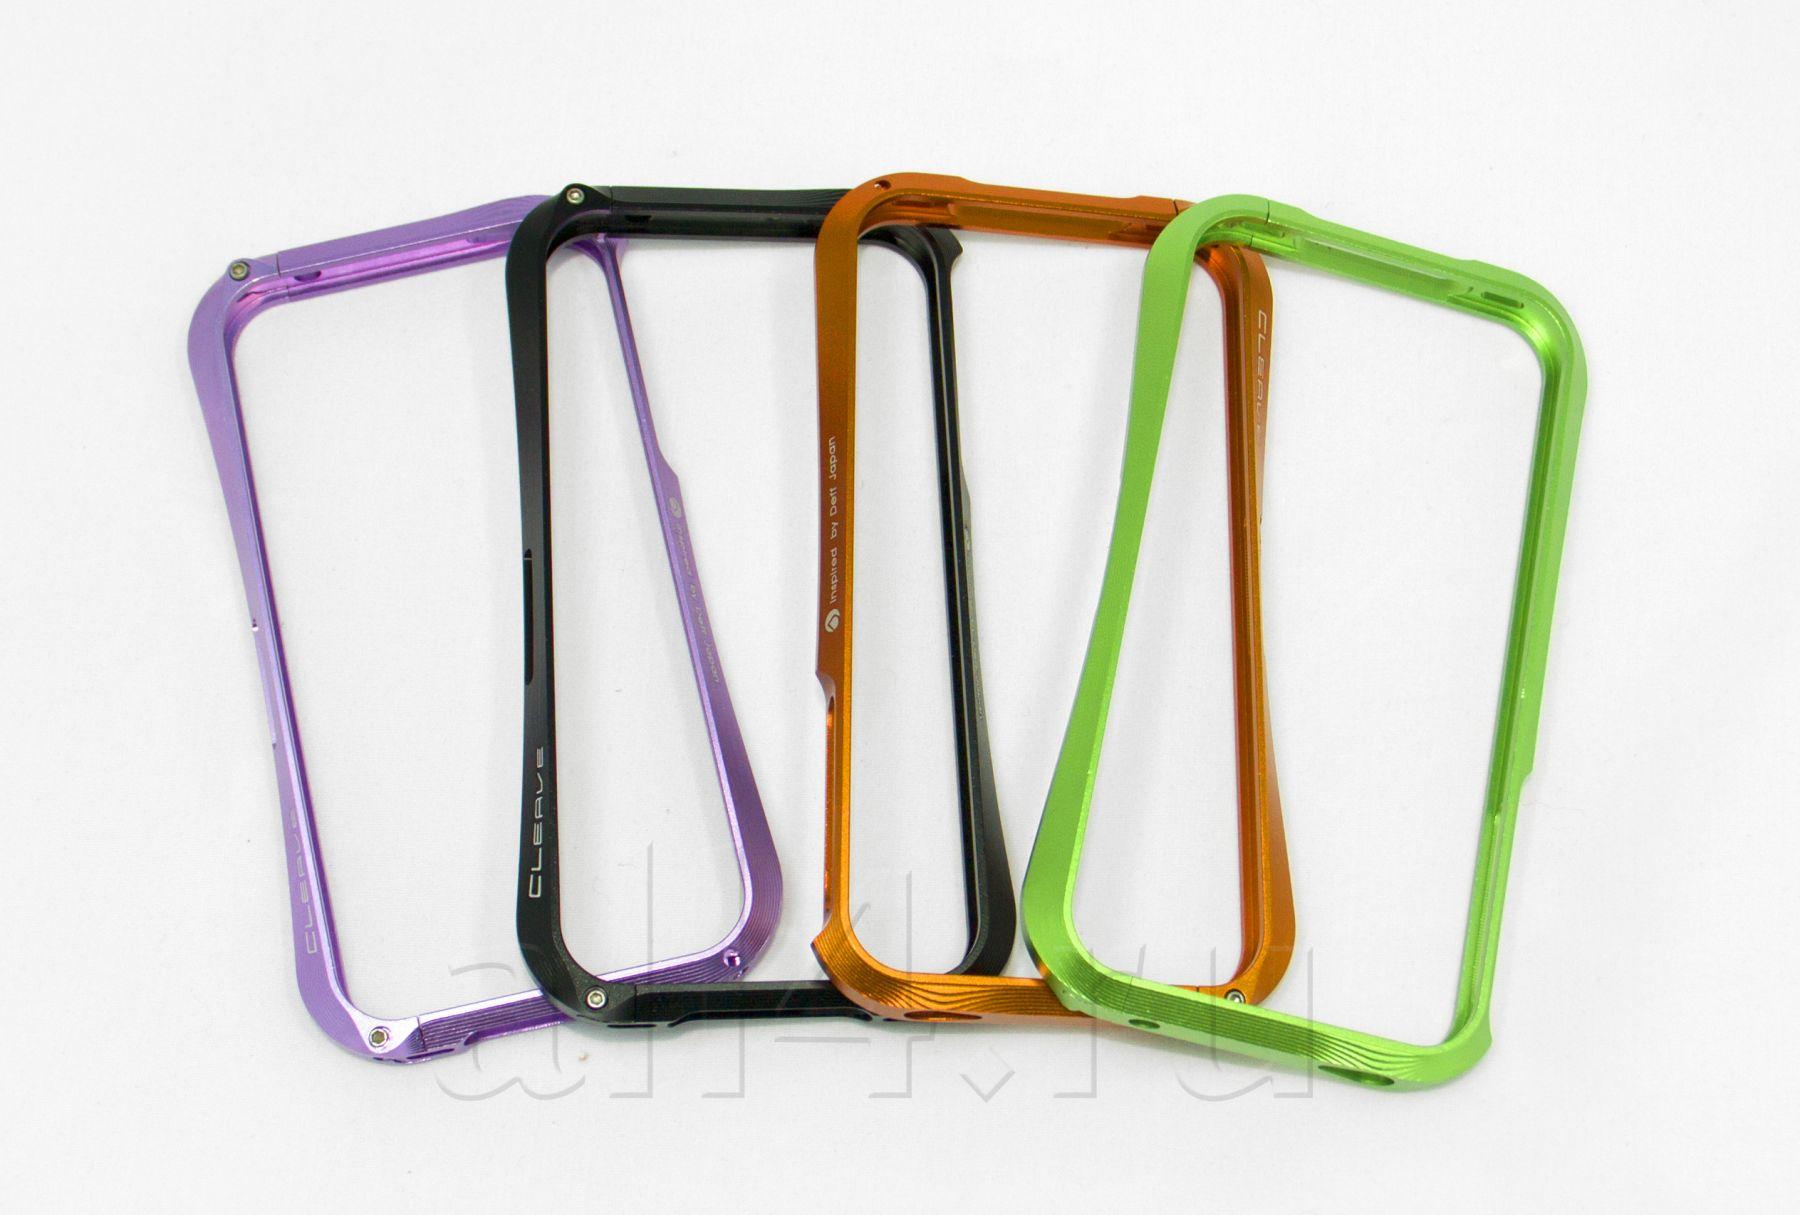 Бампер металлический CLEAVE  для iPhone 4/4S зеленый